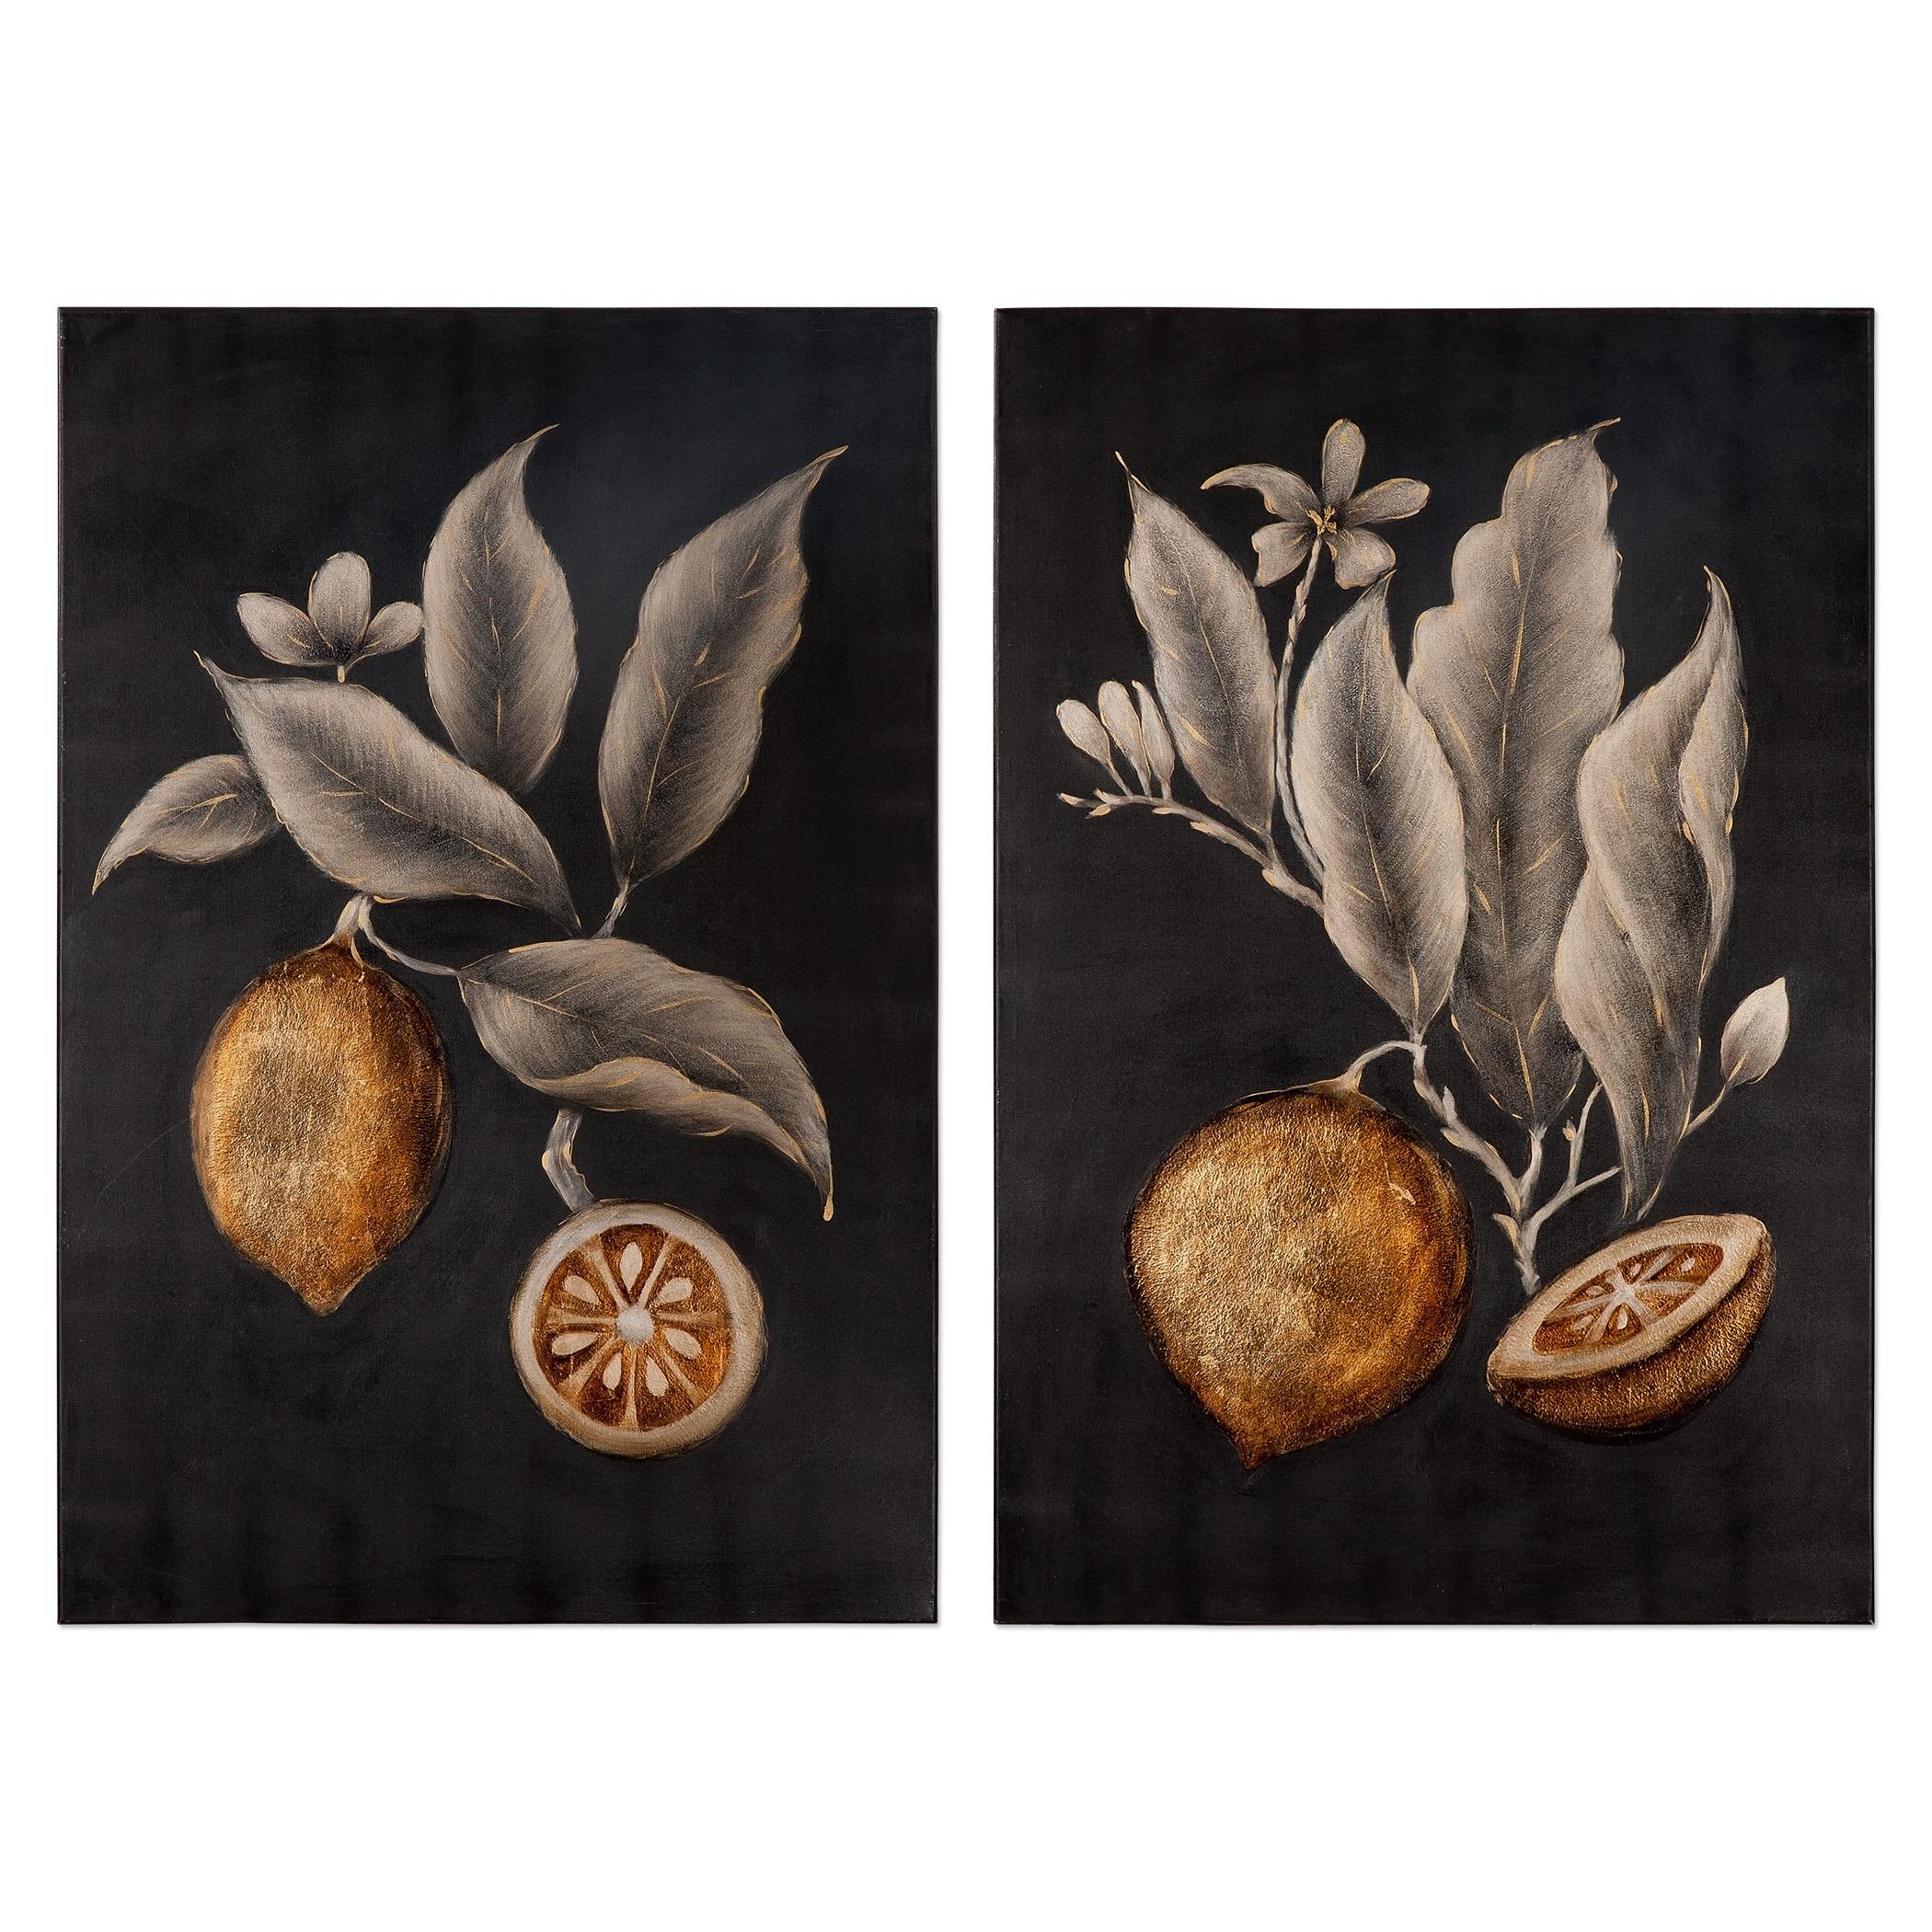 Uttermost Art Citrus Study Hand Painted Art, S/2 - Item Number: 36109